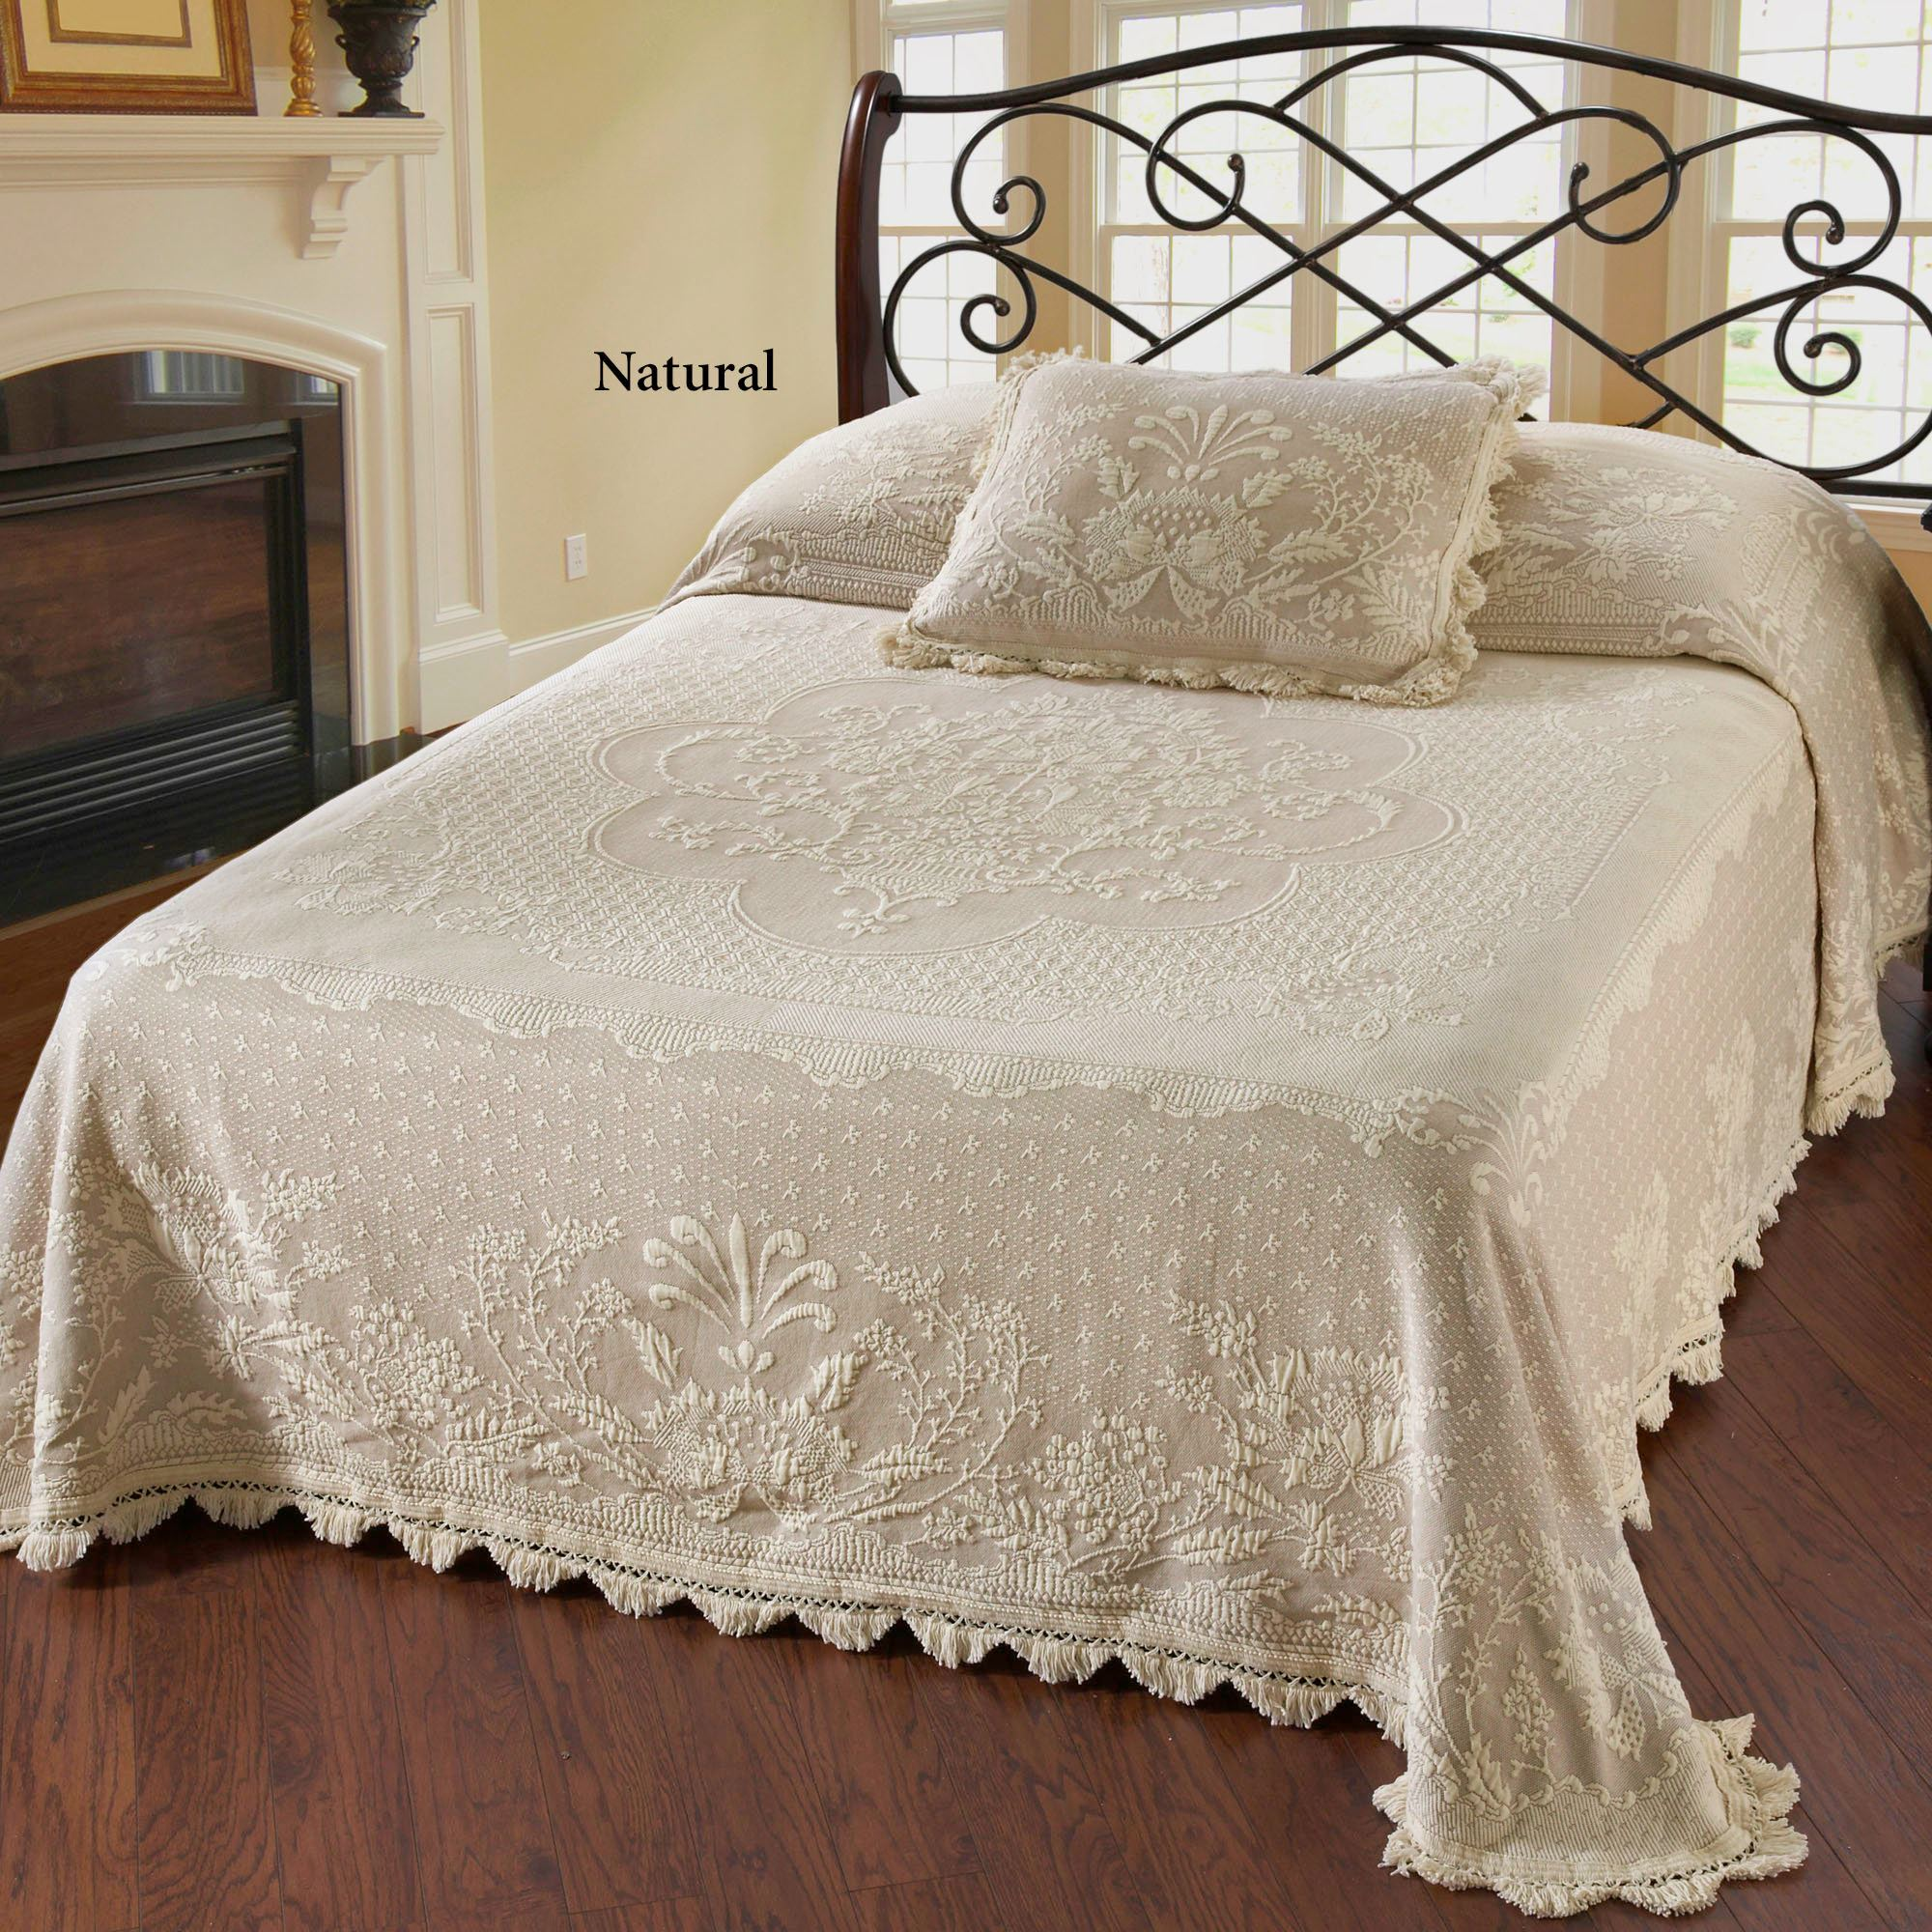 Captivating Abigail Adams Matelasse Bedspread. Click To Expand